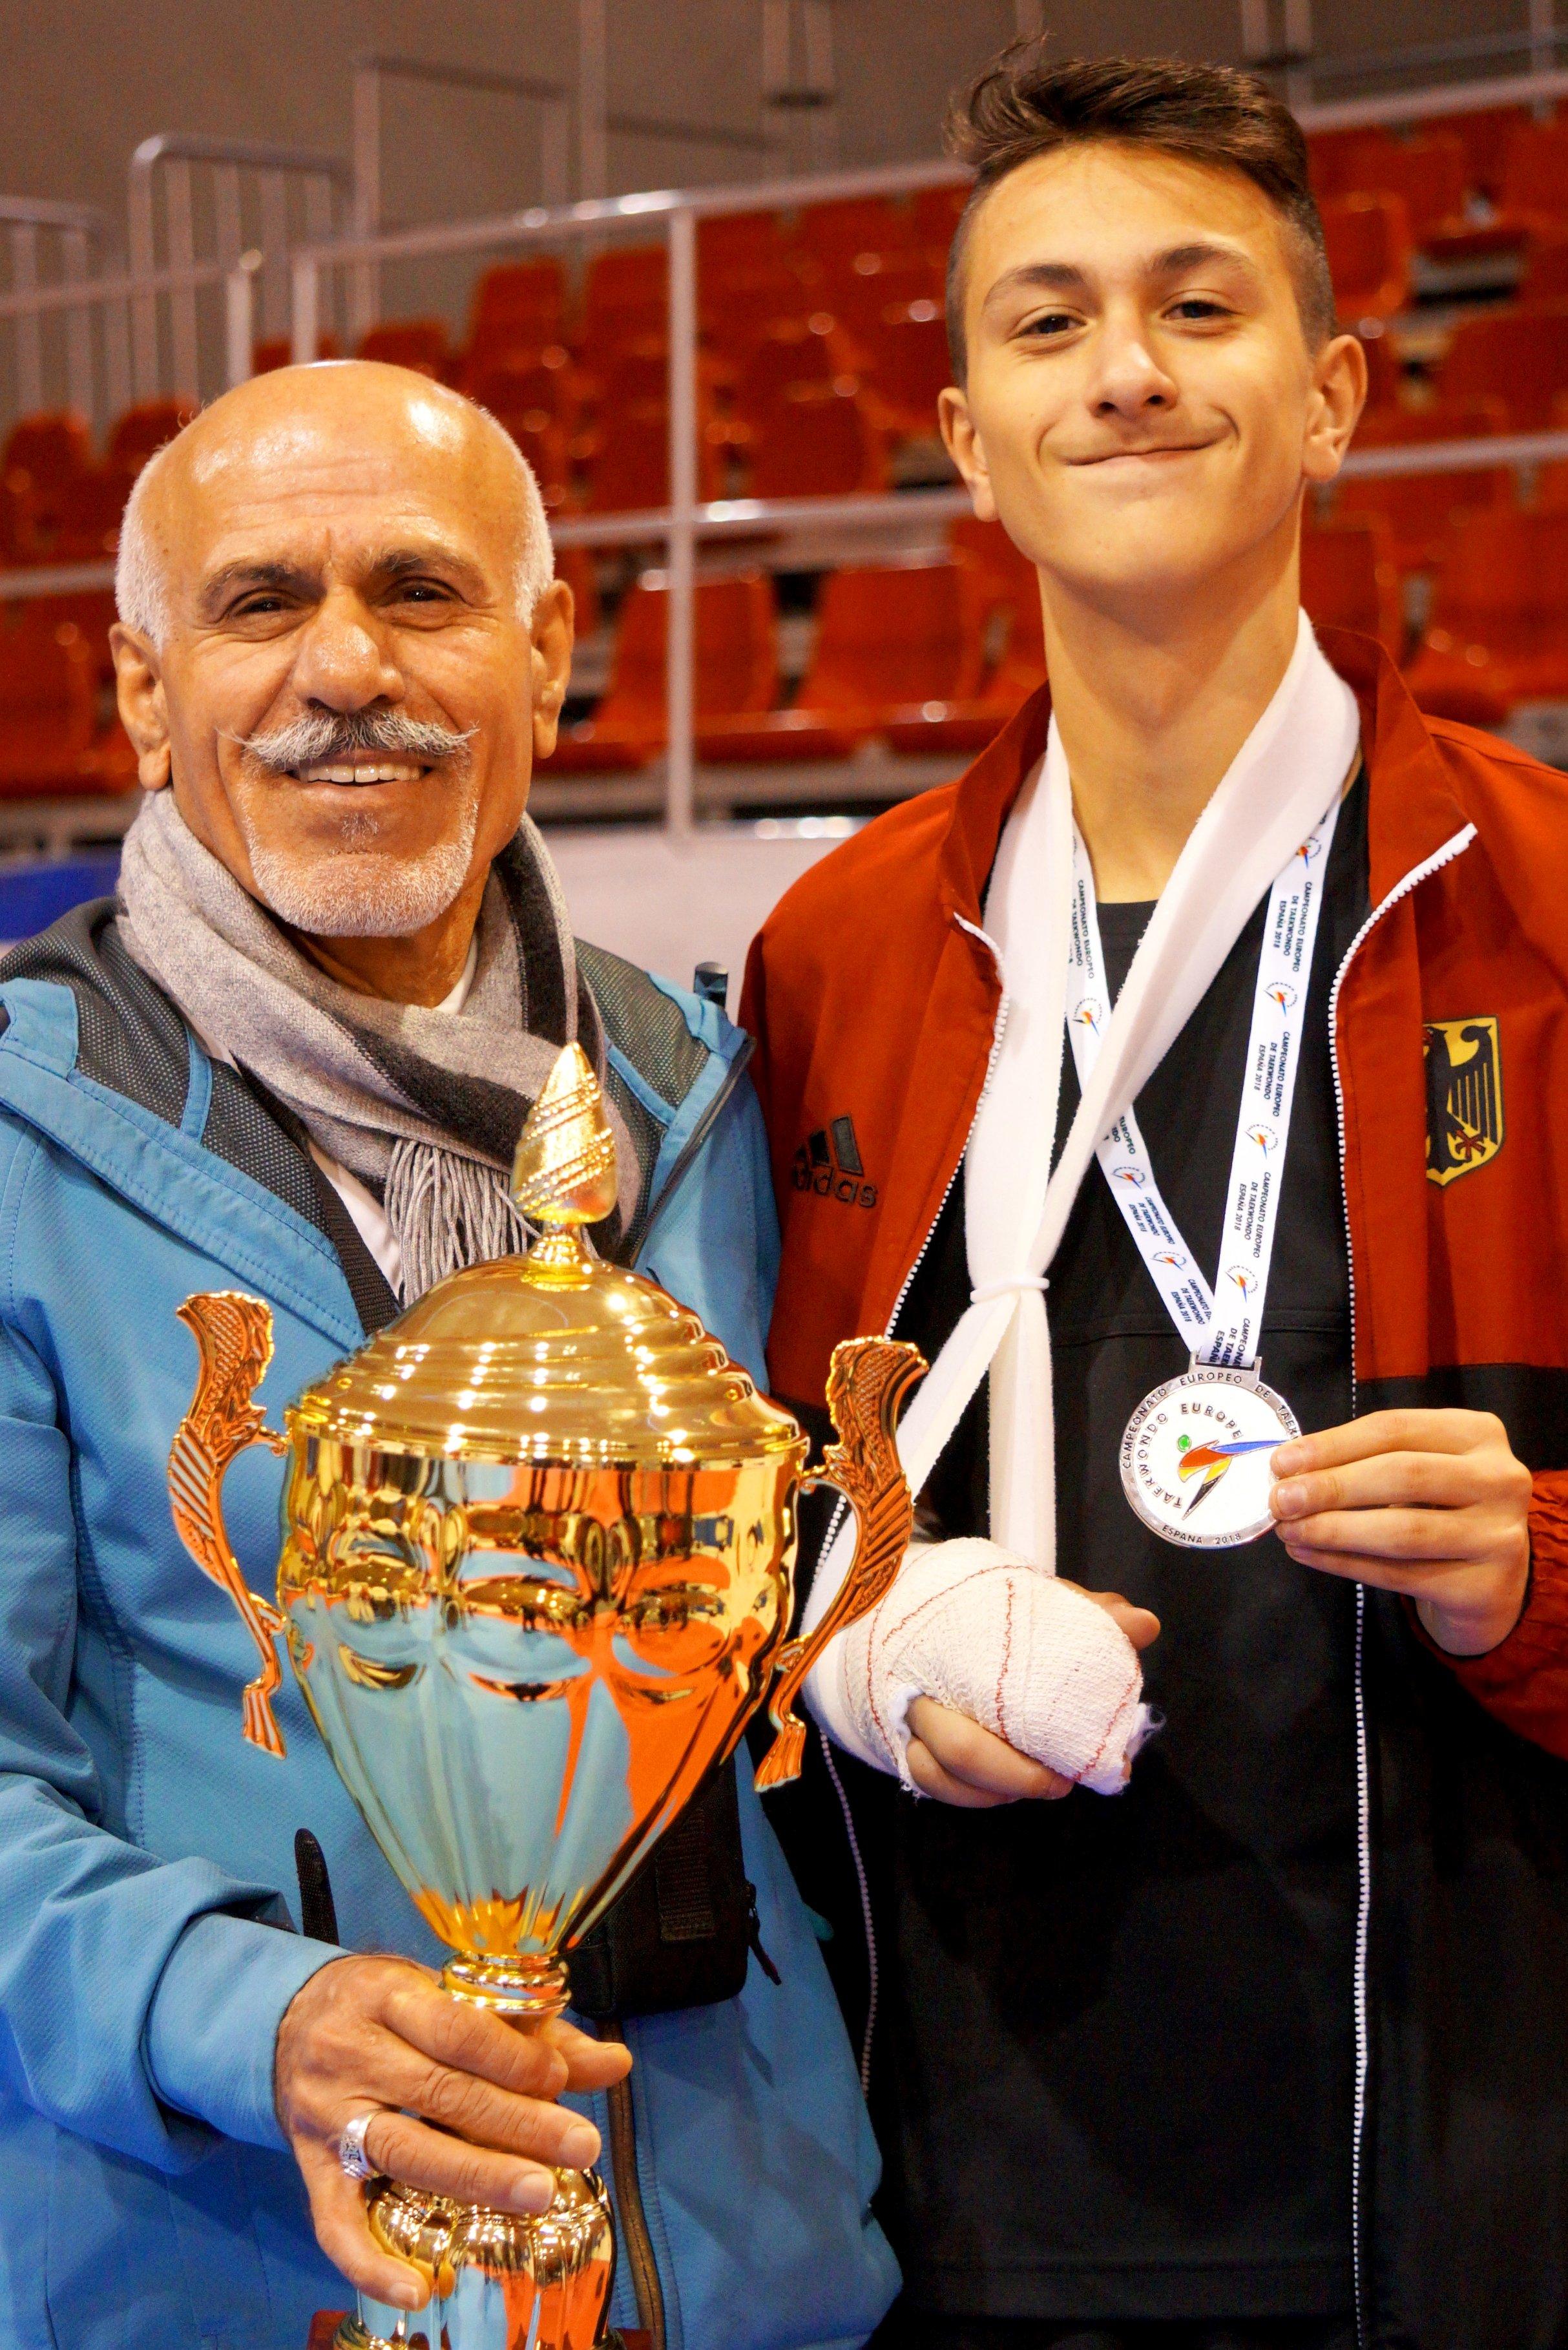 Emre Tepe und sein Großvater Sevket Tepe mit Emres Silber-Medaille bei der U15-EM 2018